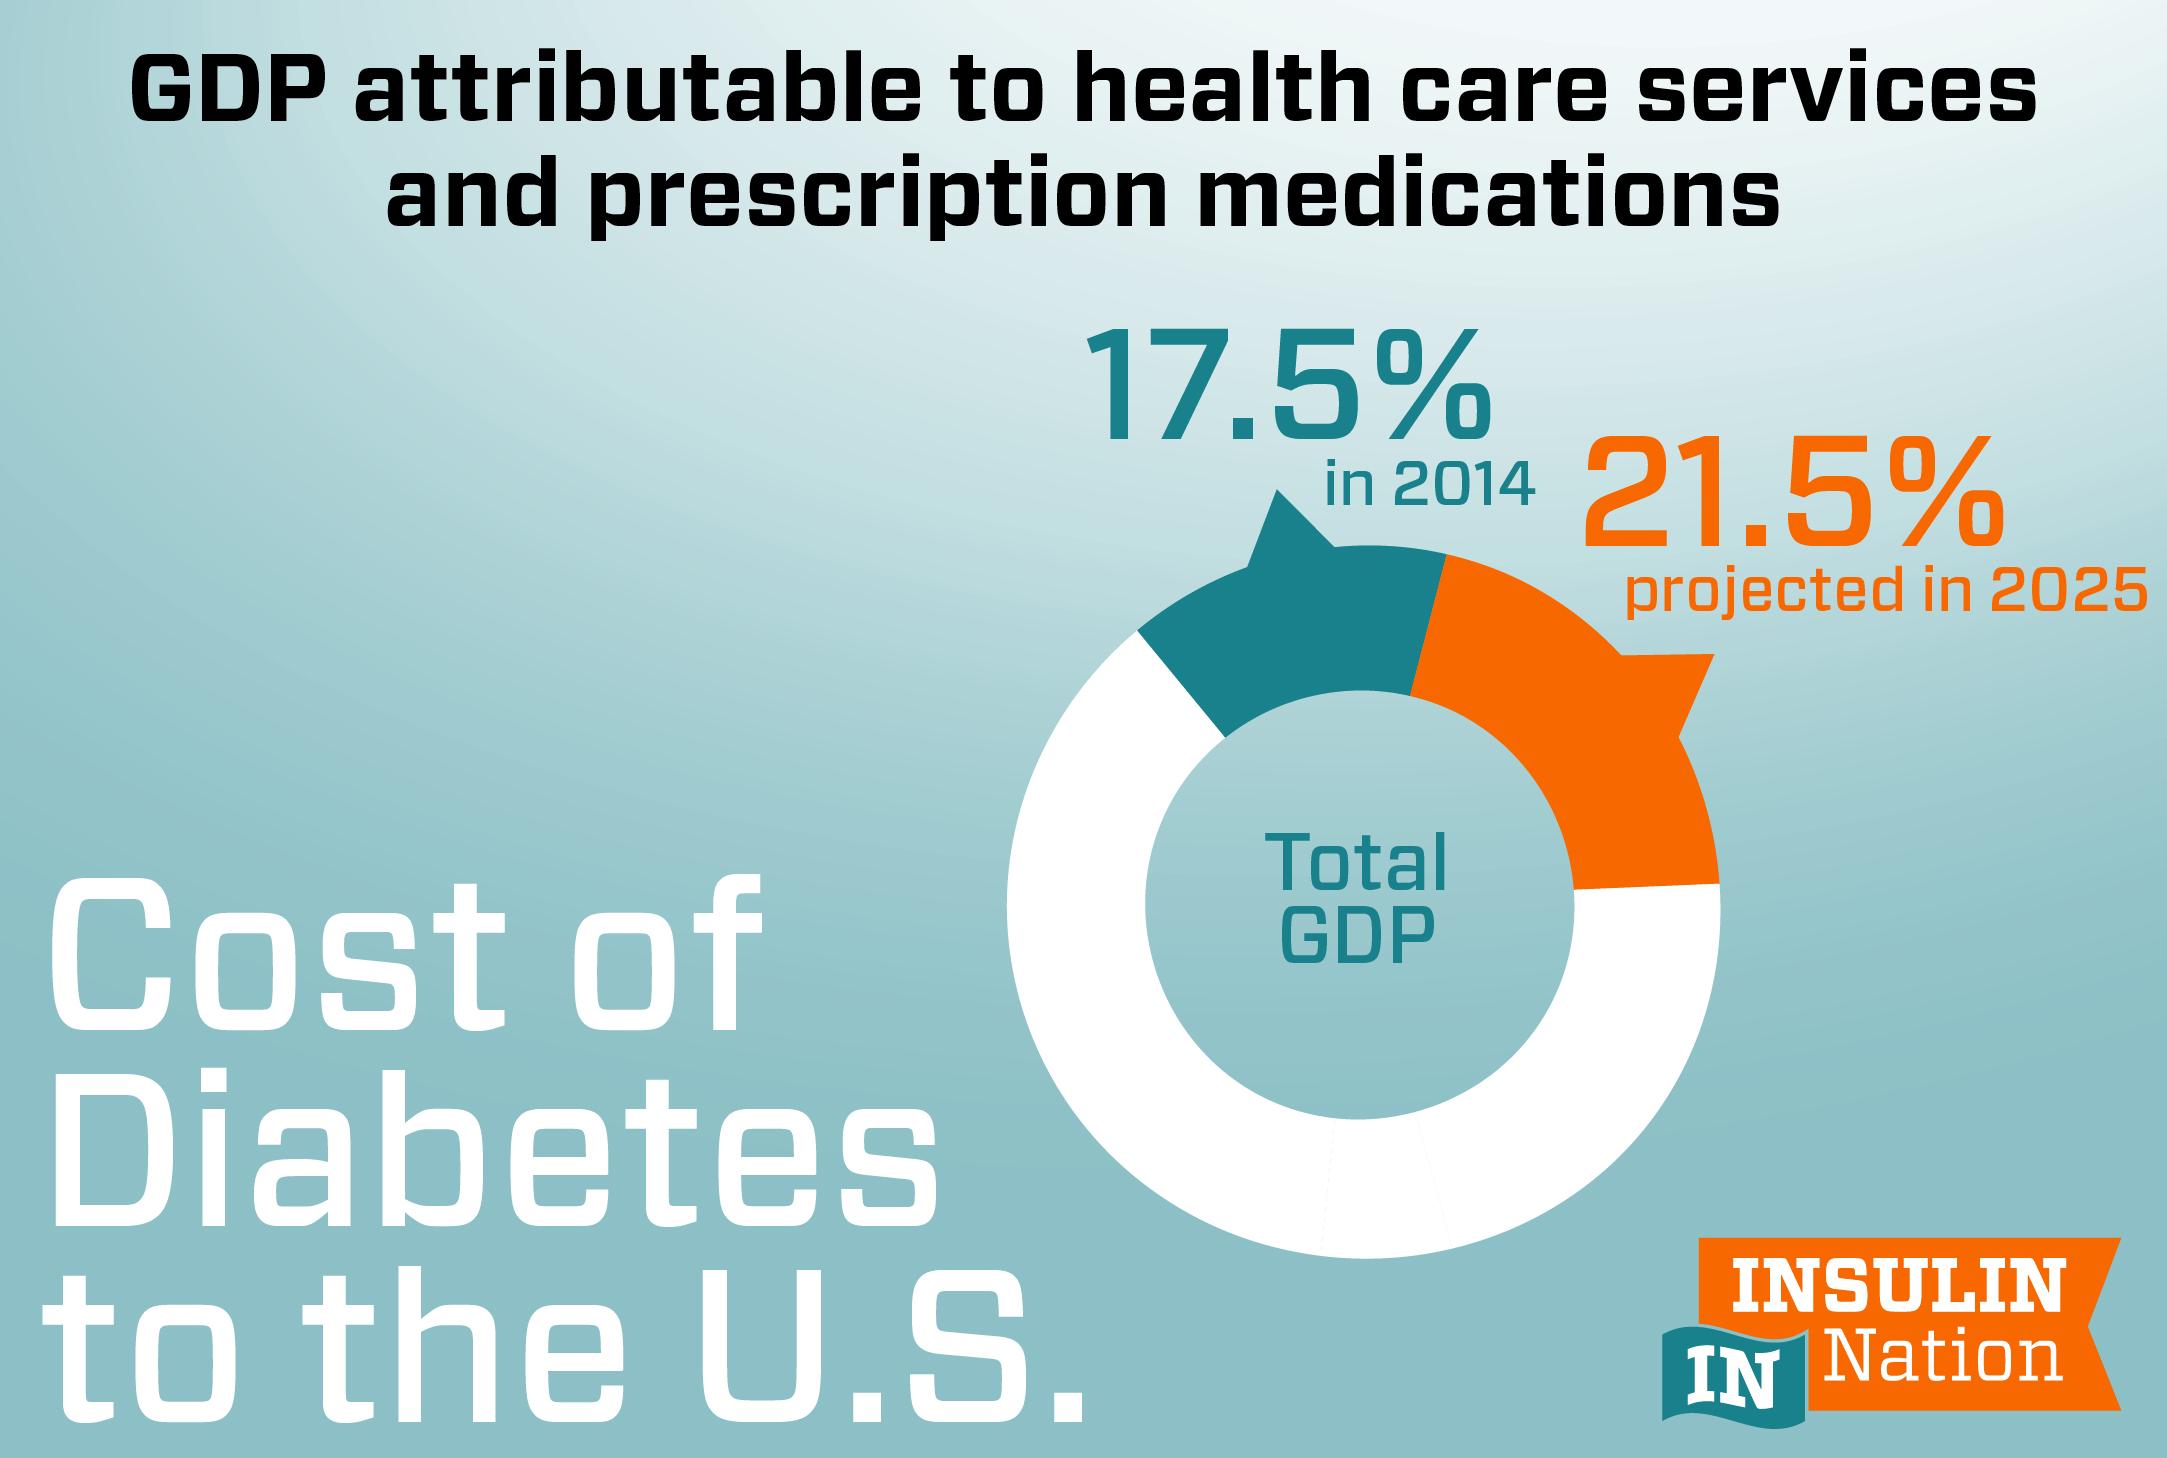 insulin_nation_diabetes_price_usa-03